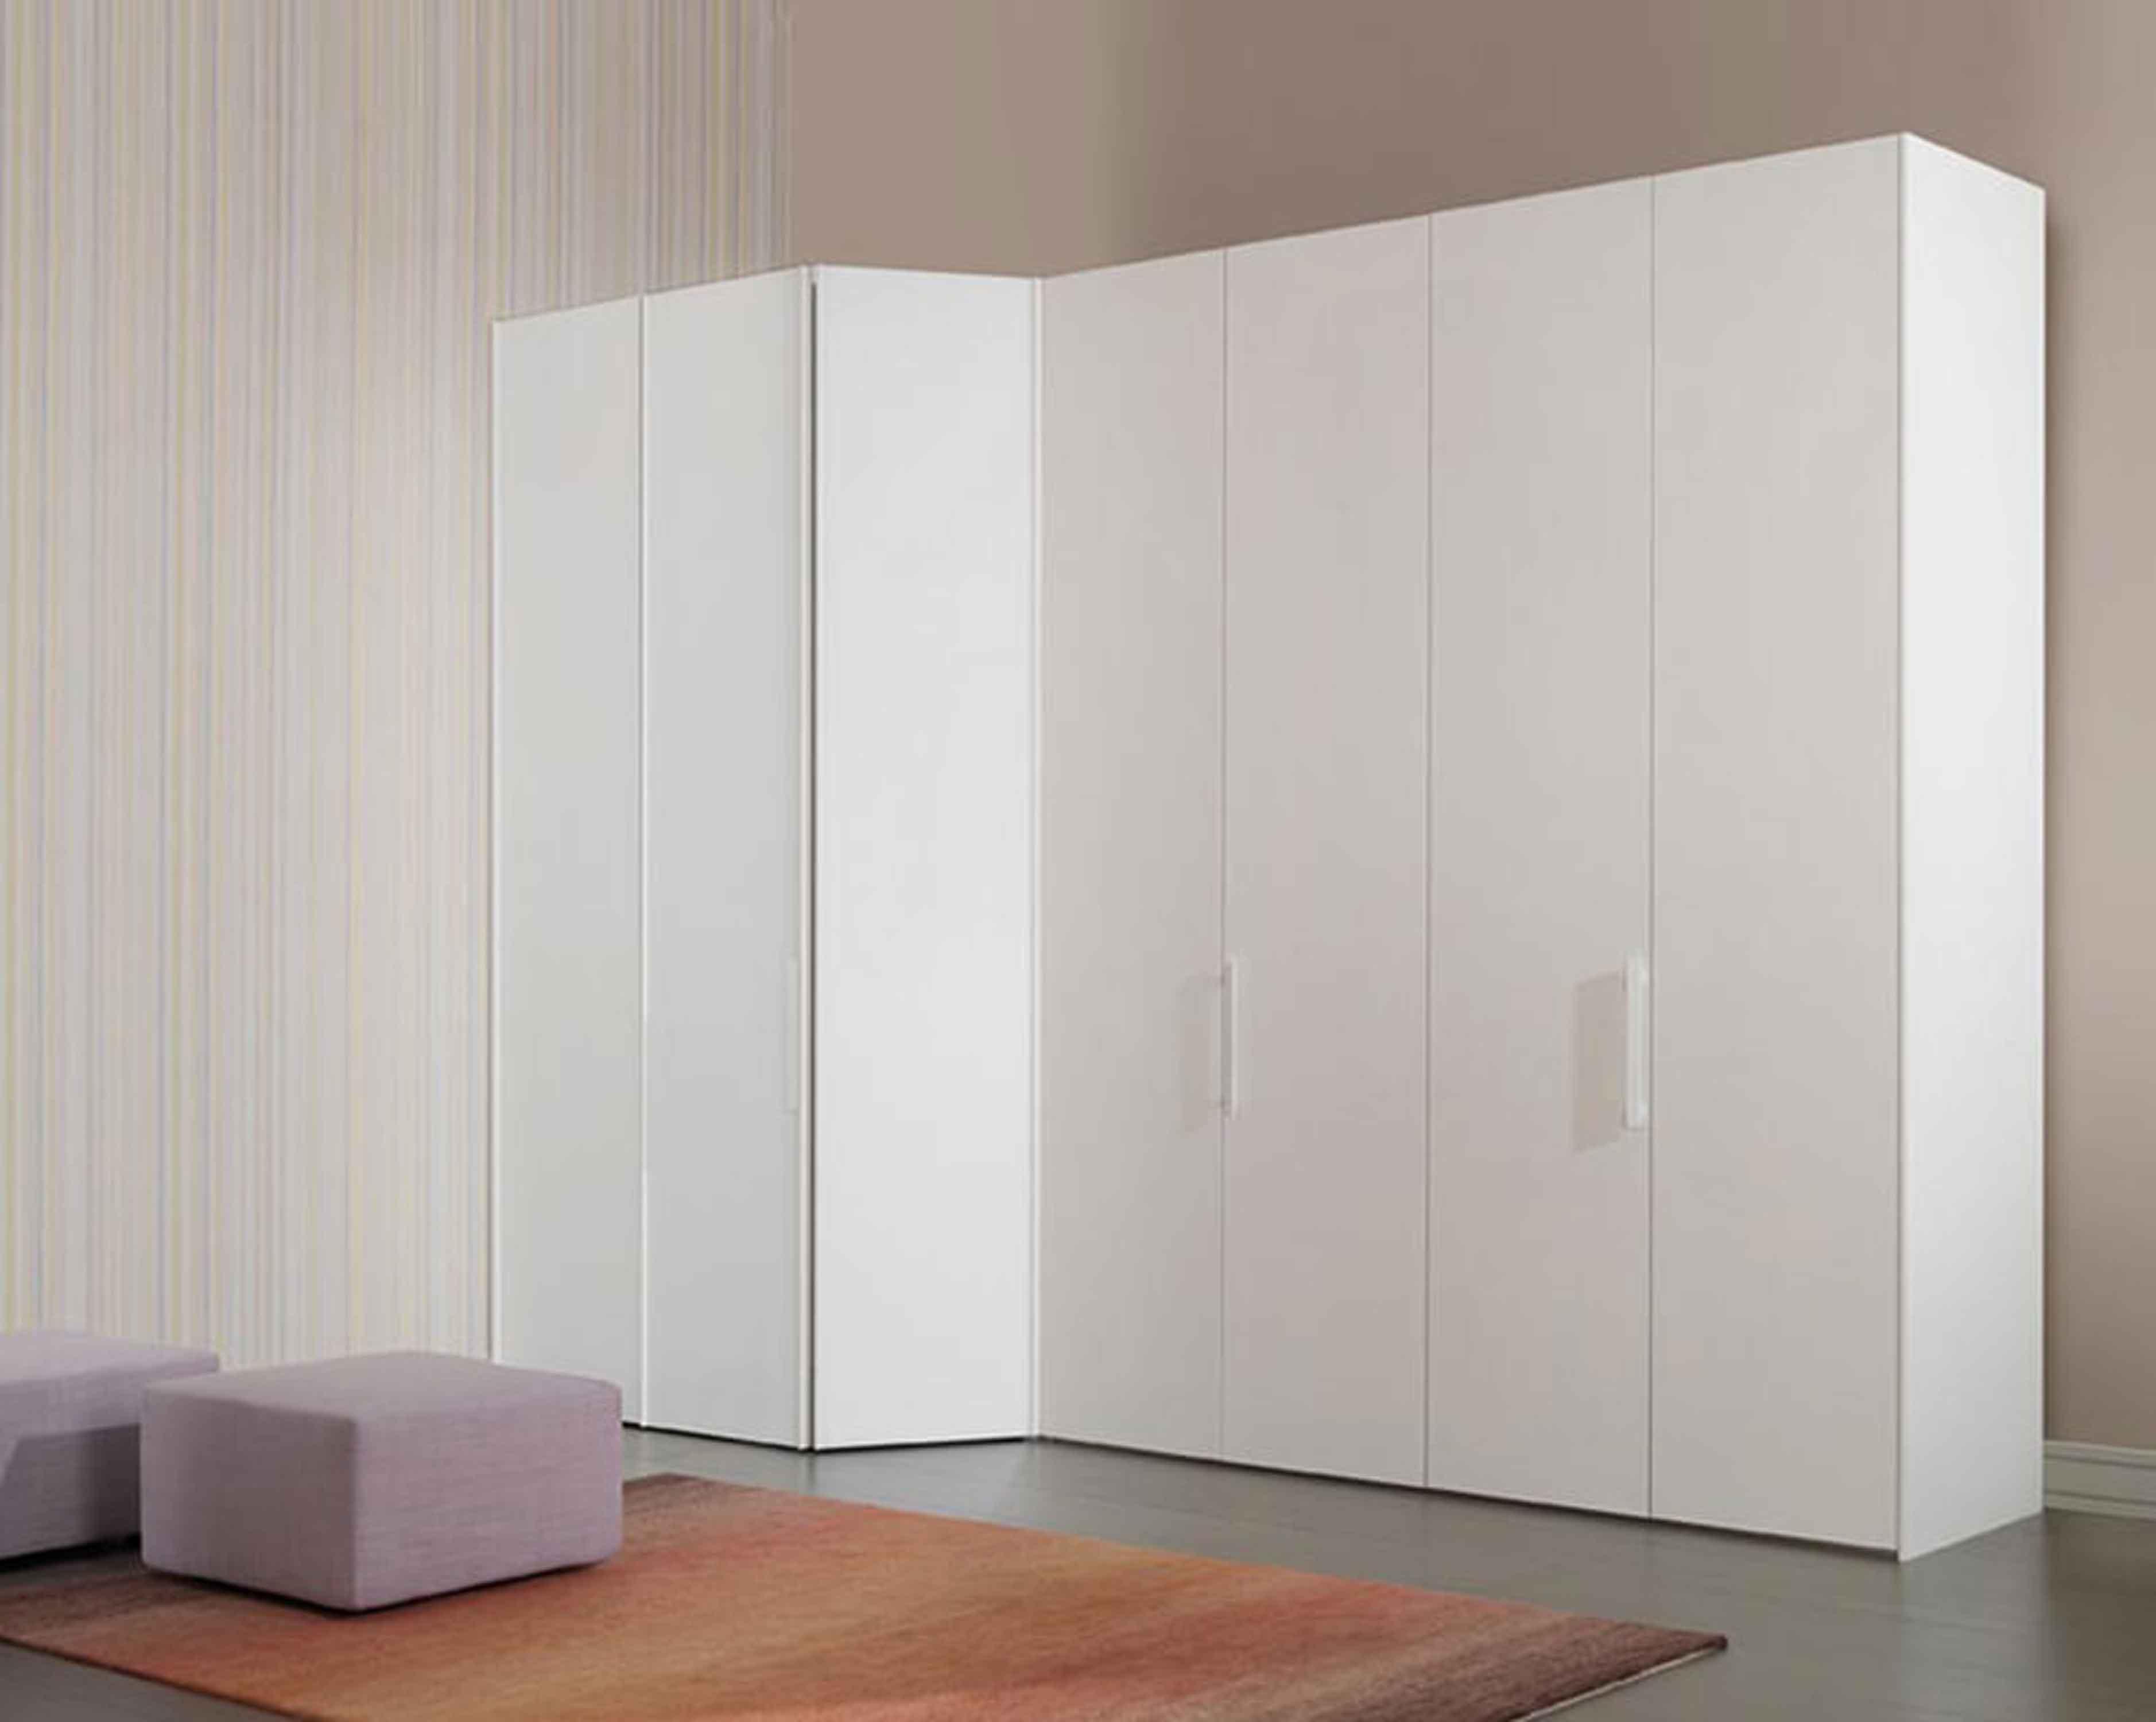 03S_Estel_wardrobe-walk-incloset_ANTEPRIMA